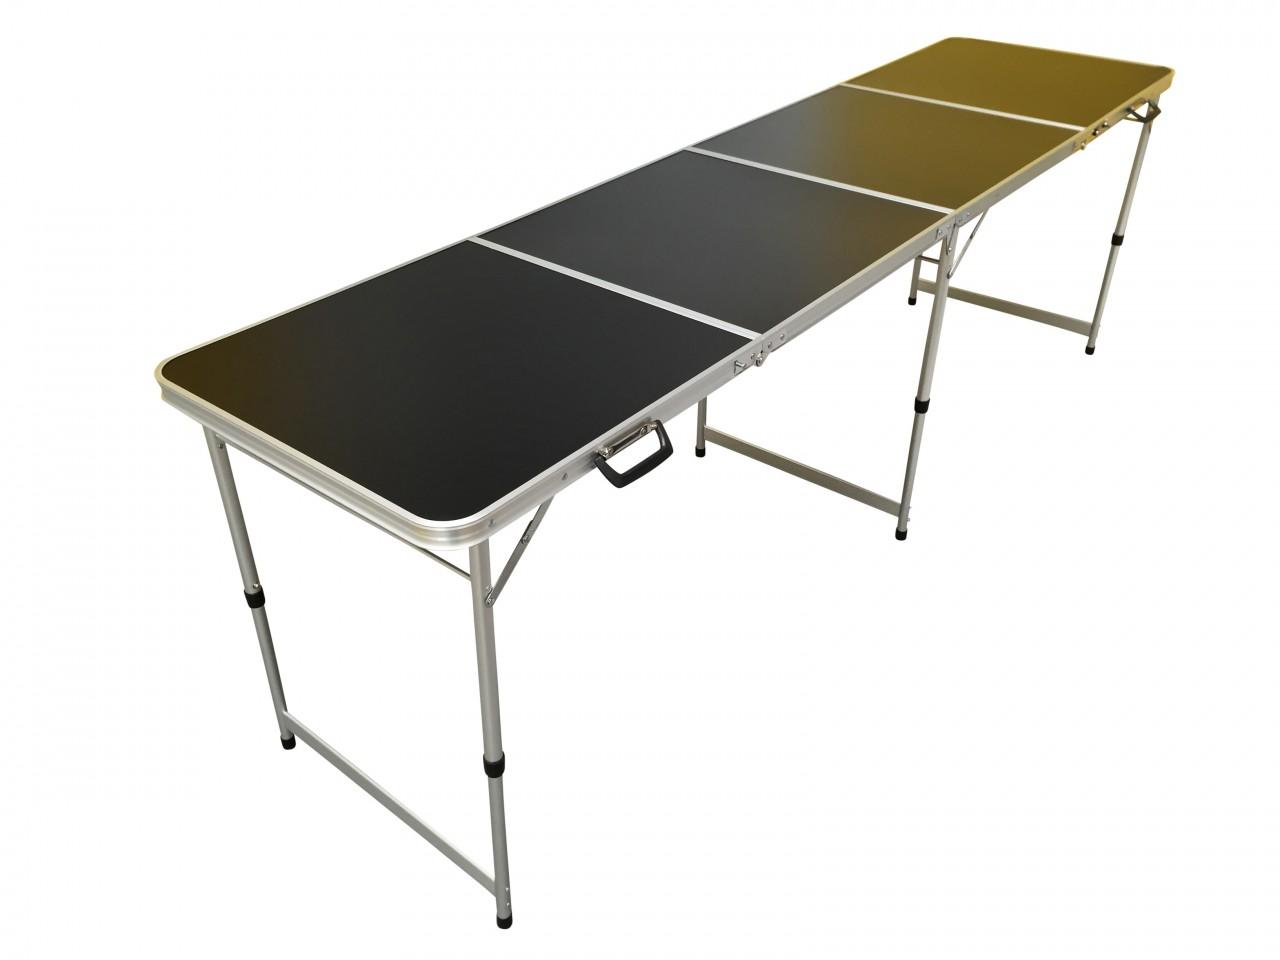 8FT ALUMINIUM LIGHTWEIGHT FOLDING TABLE BLACK Eazy Goods